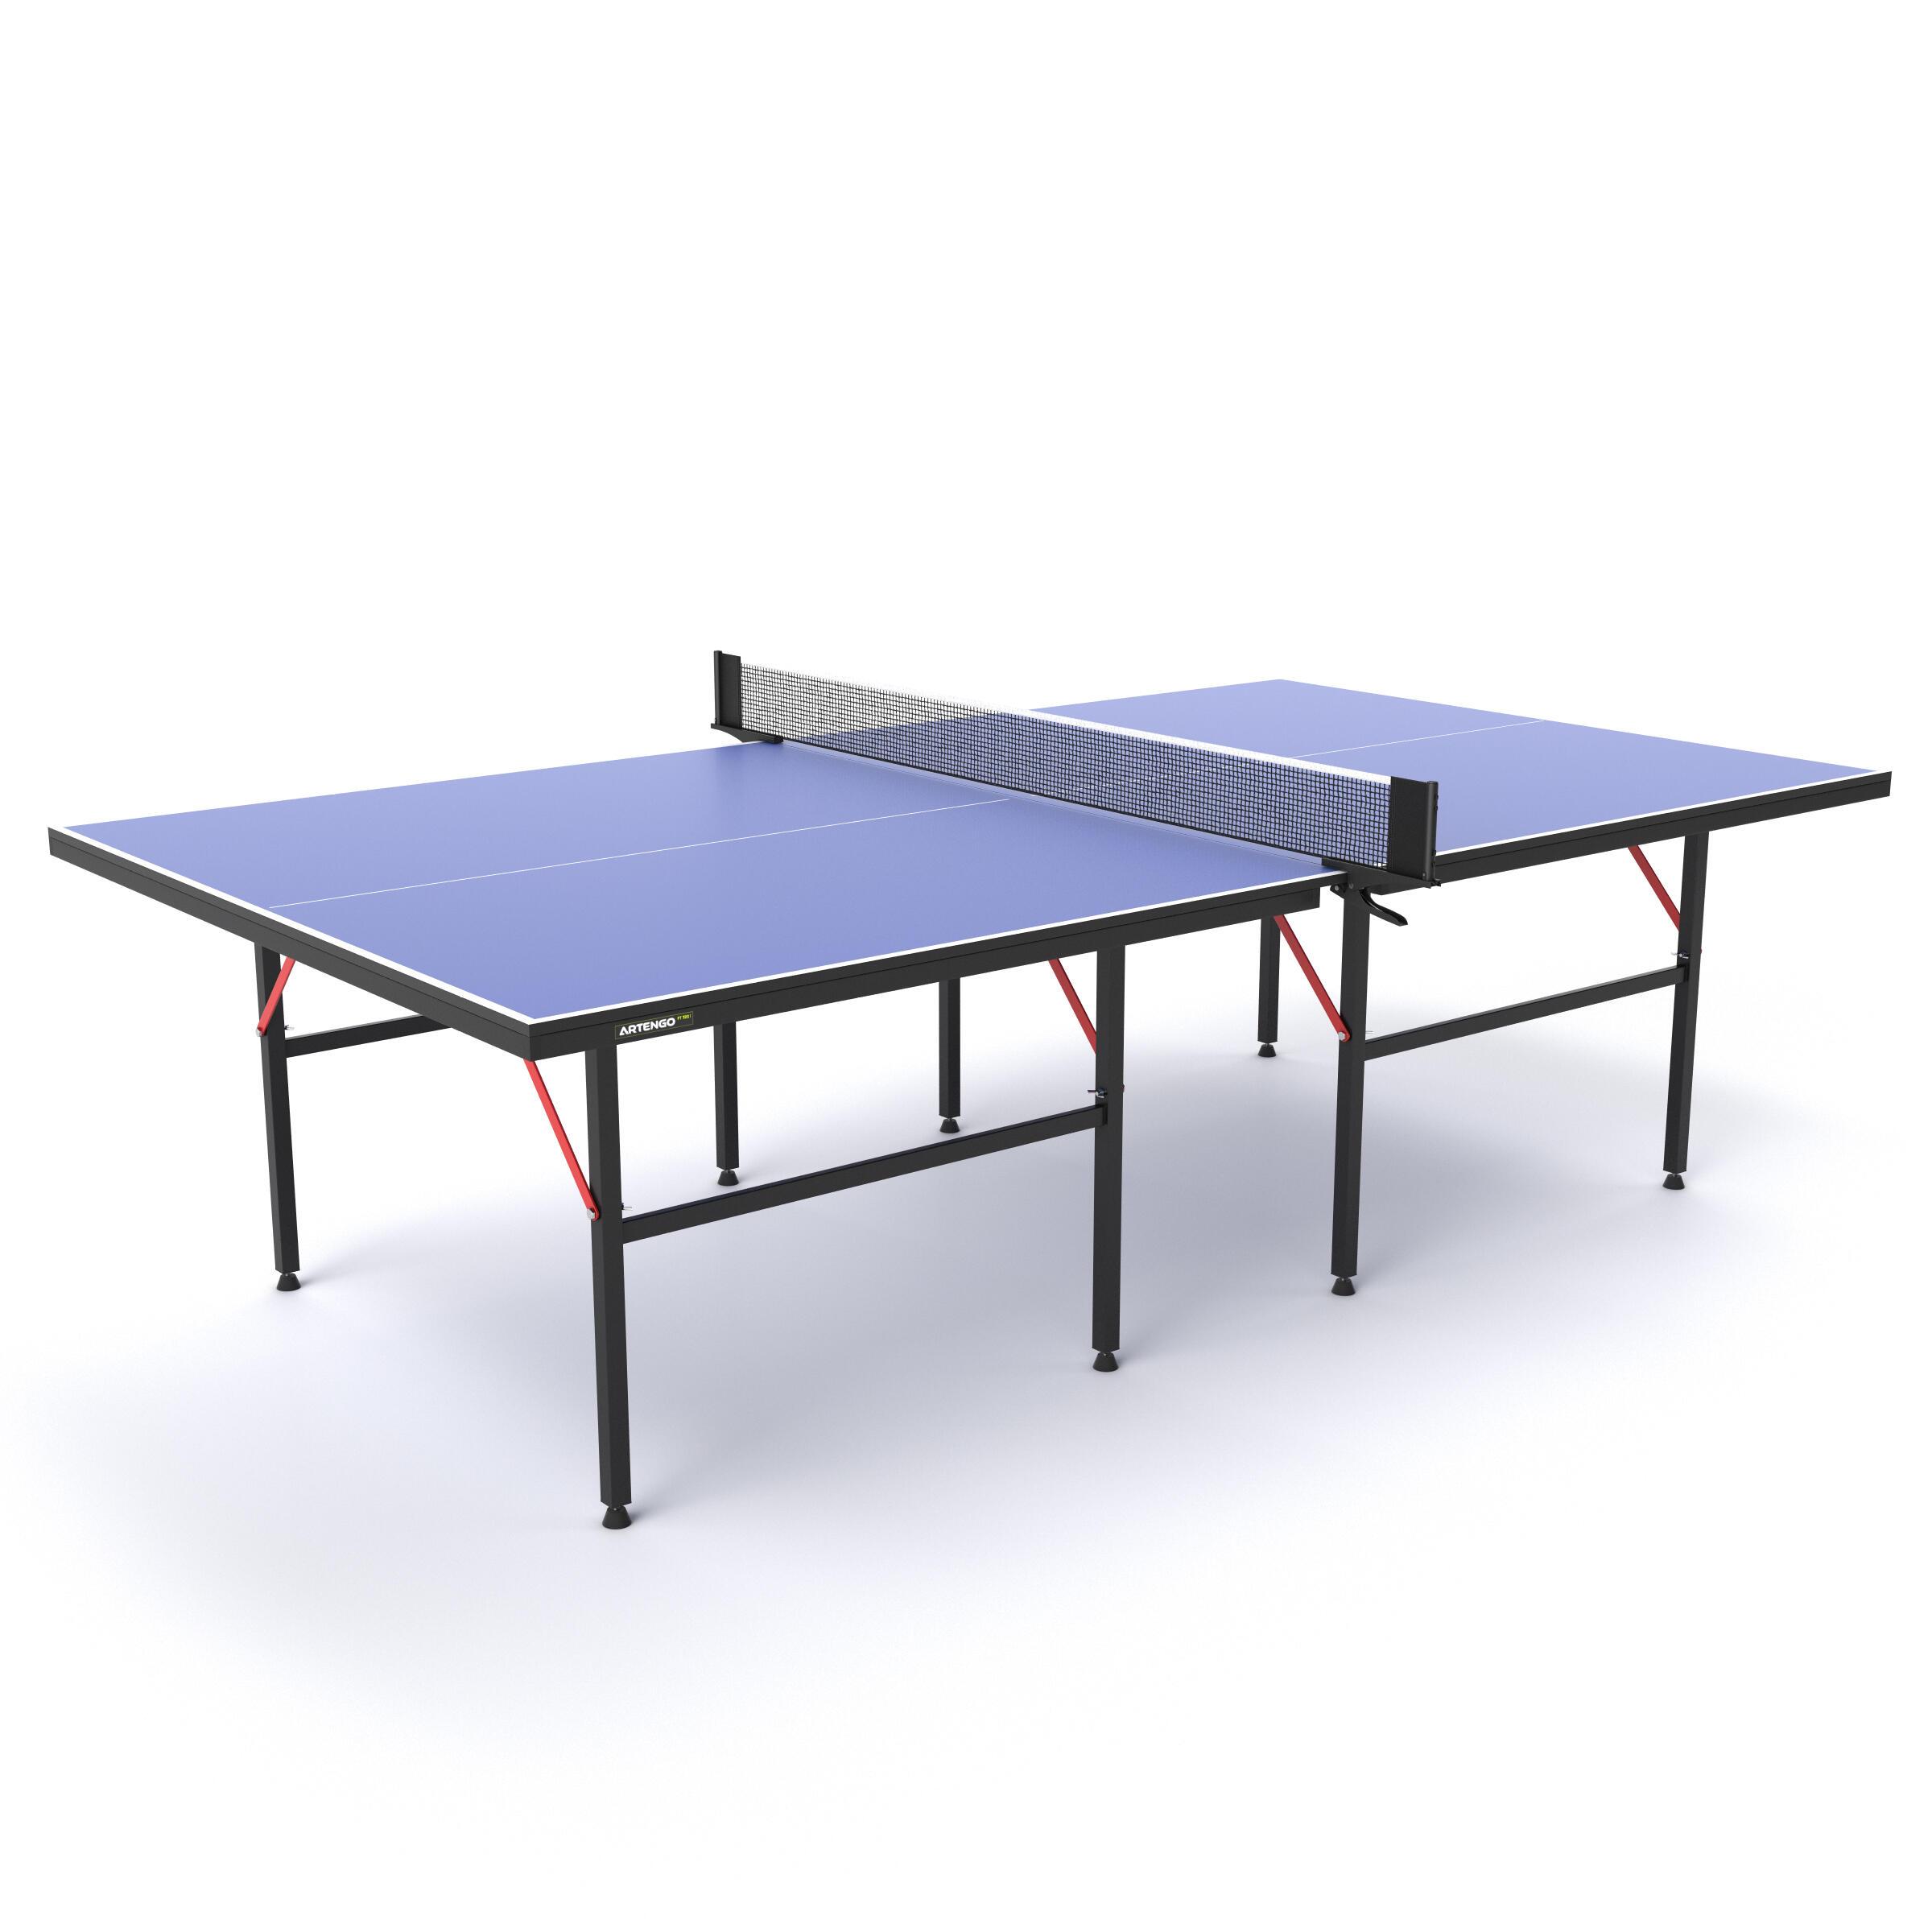 Photo de table-de-ping-pong-dinterieur-decathlon-ft720-bleu-artengo